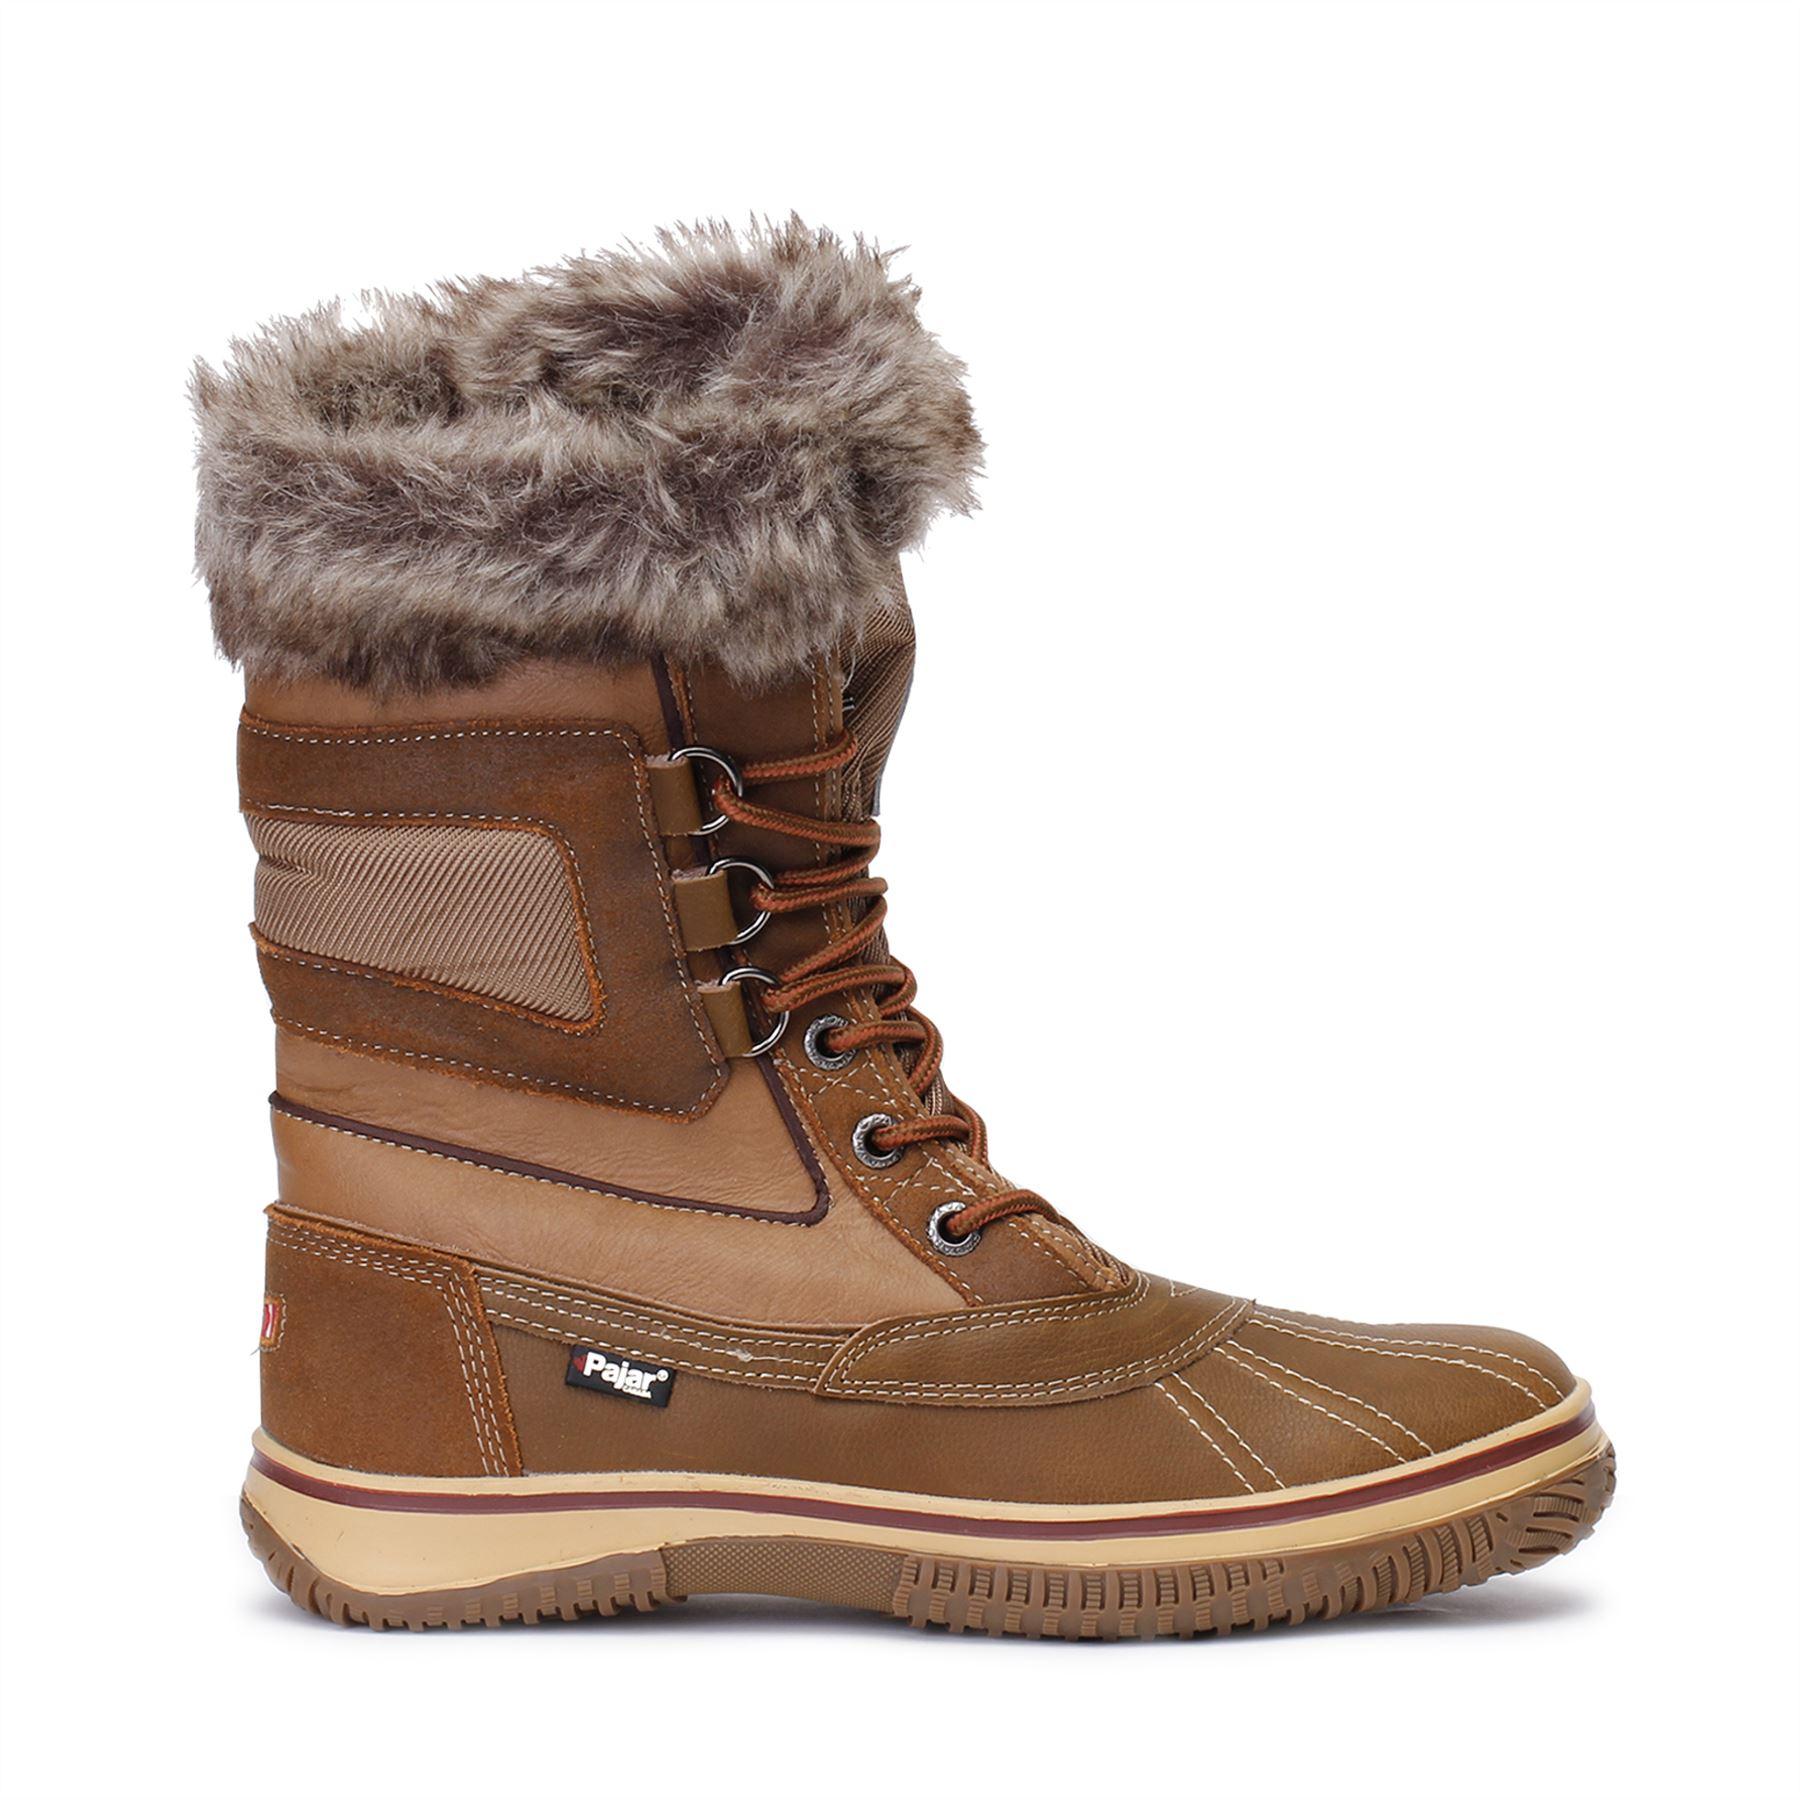 Pajar Canada Mens Tuscan Snow Boots Lined Waterproof Cognac ...